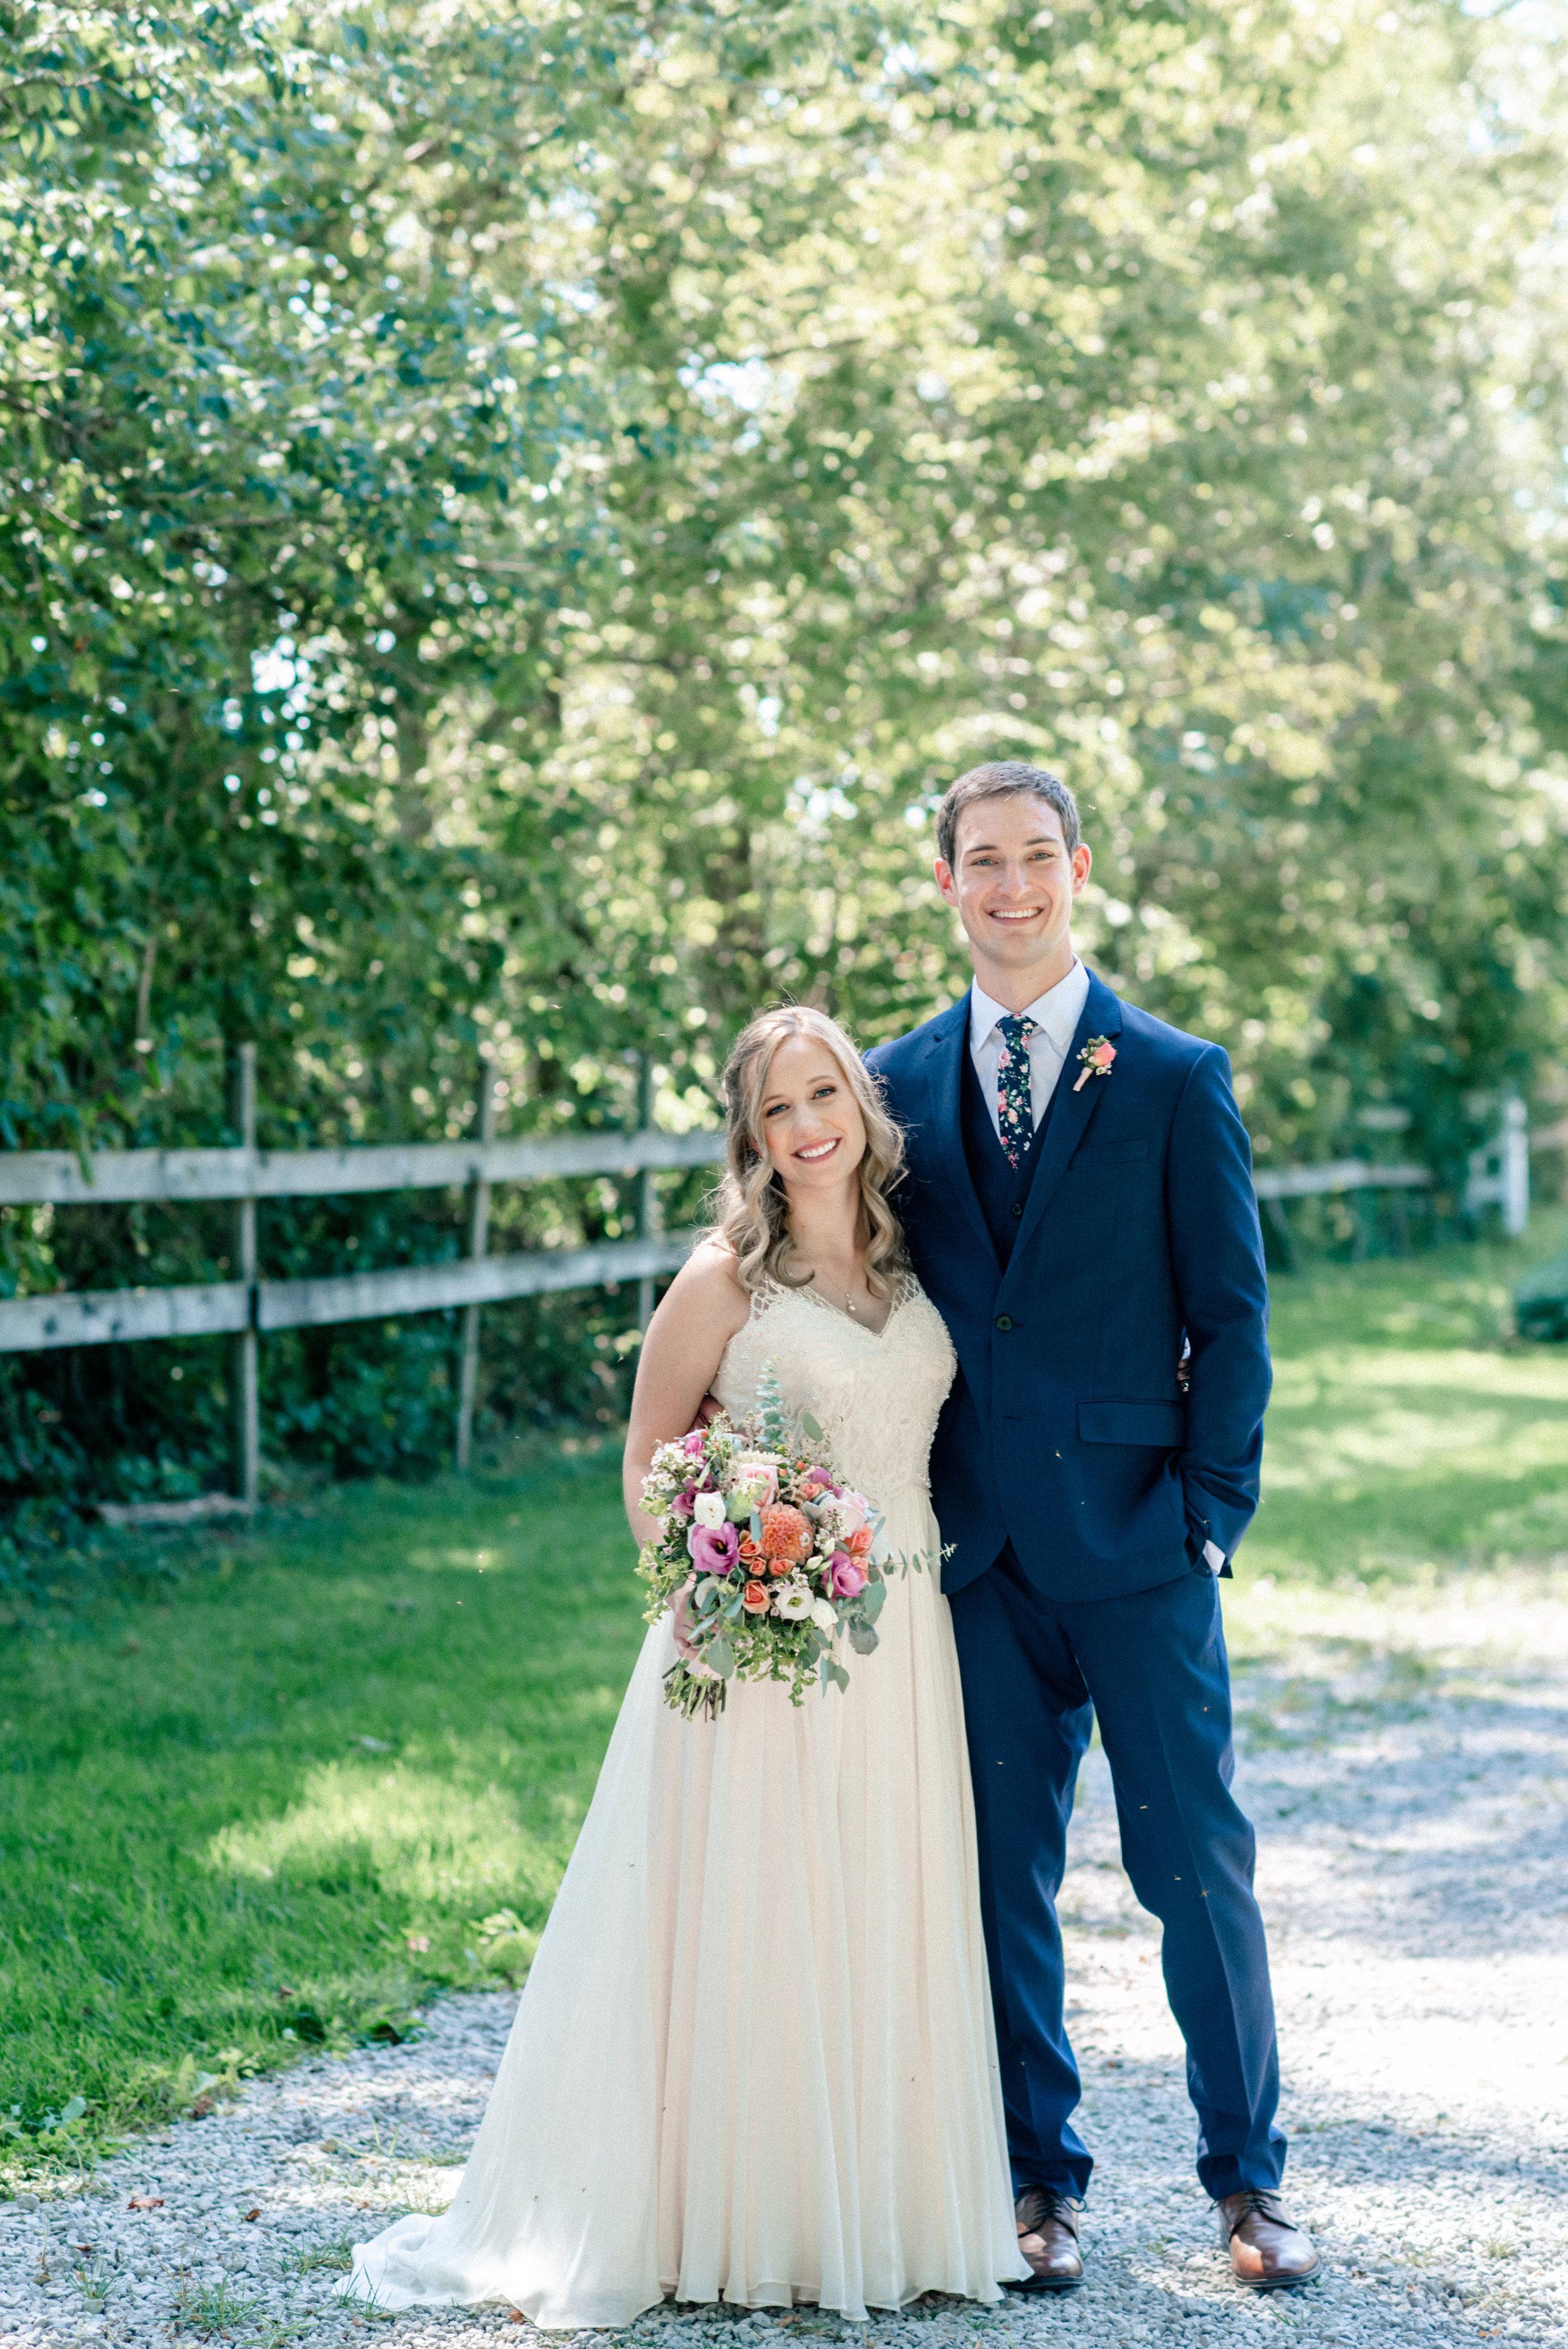 Brideandgroom-Anna+Dan_(2_of_19).jpg